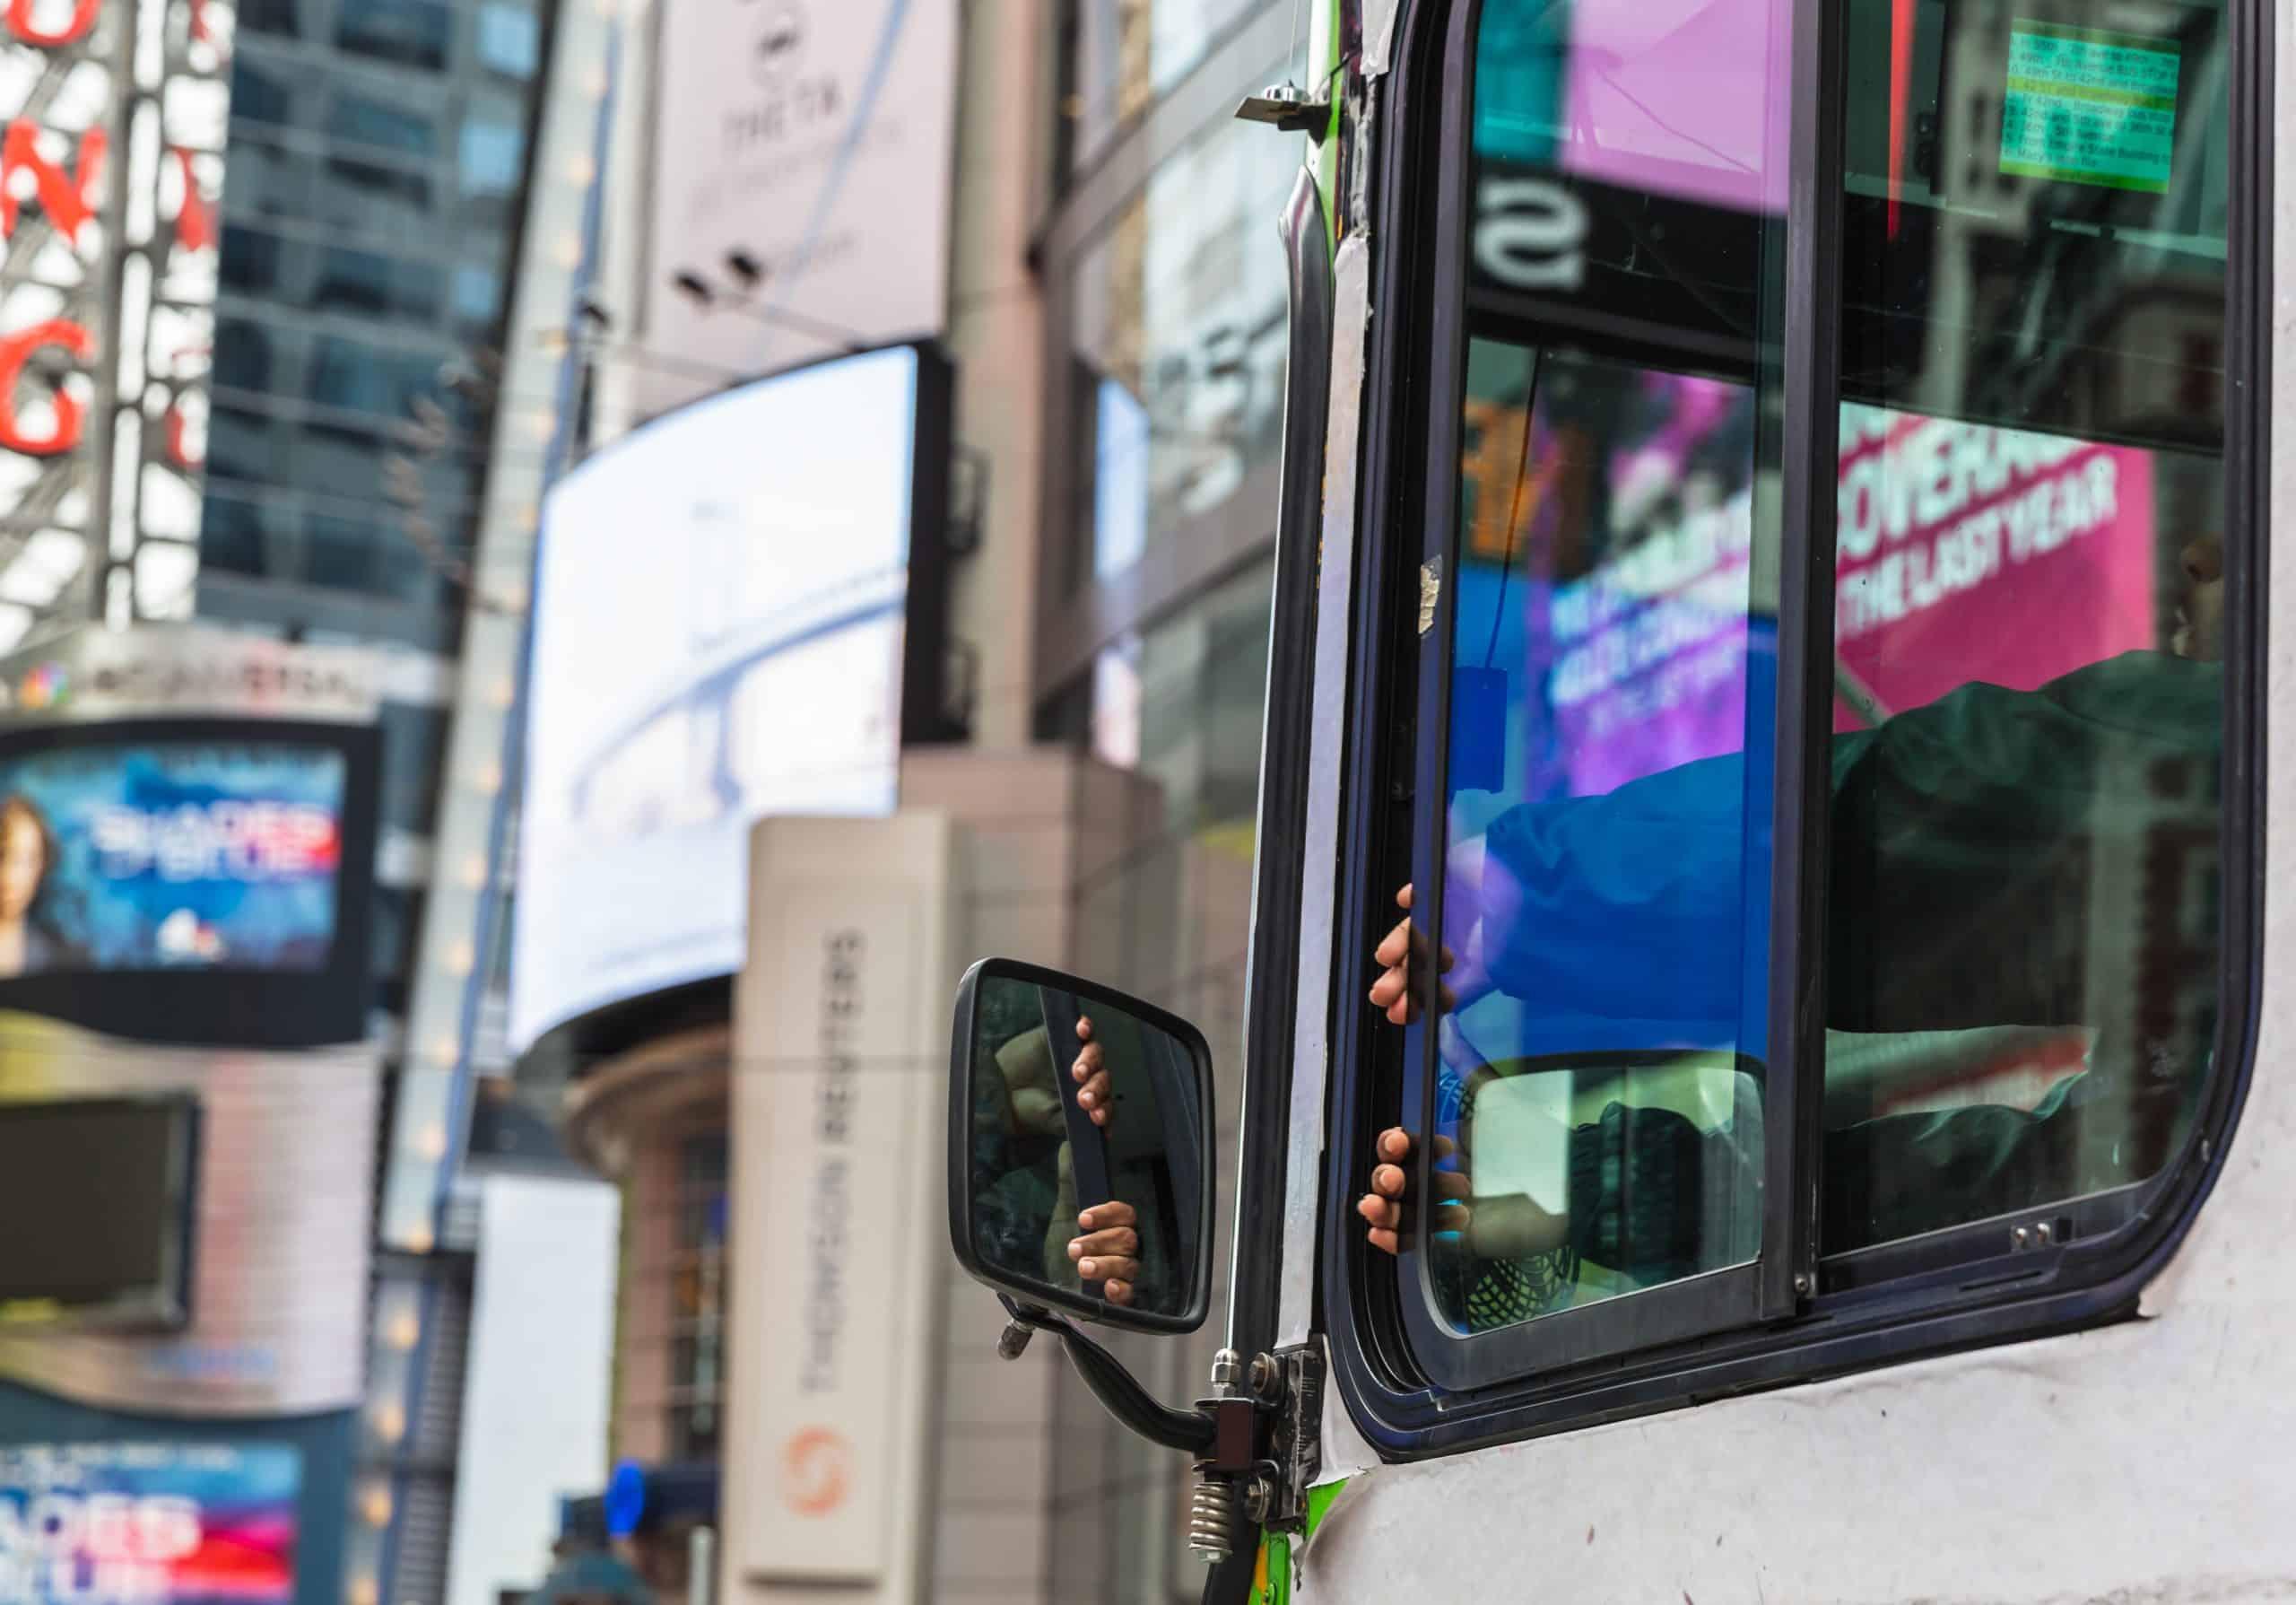 Drunken Long Island Bus Driver Causes Multiple Wrecks